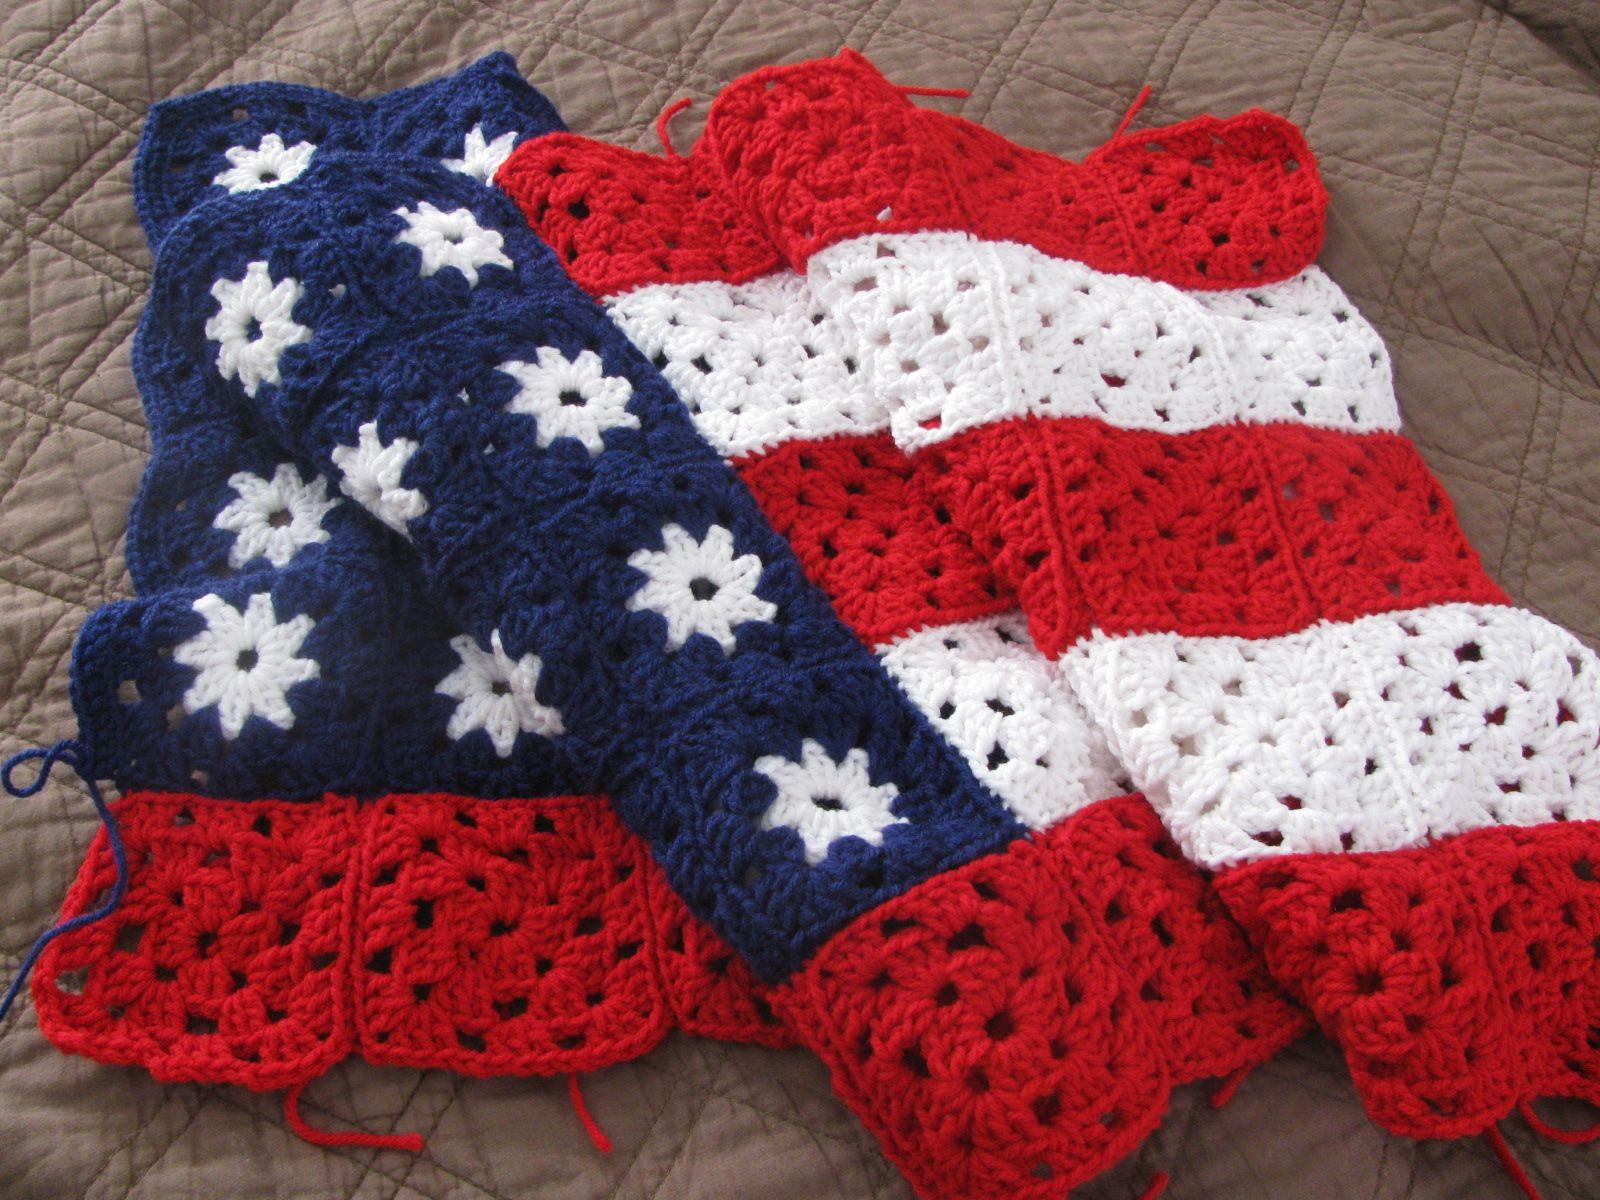 Knitting Pattern For American Flag Afghan : Crochet American Flag American flag, Patterns and Blankets